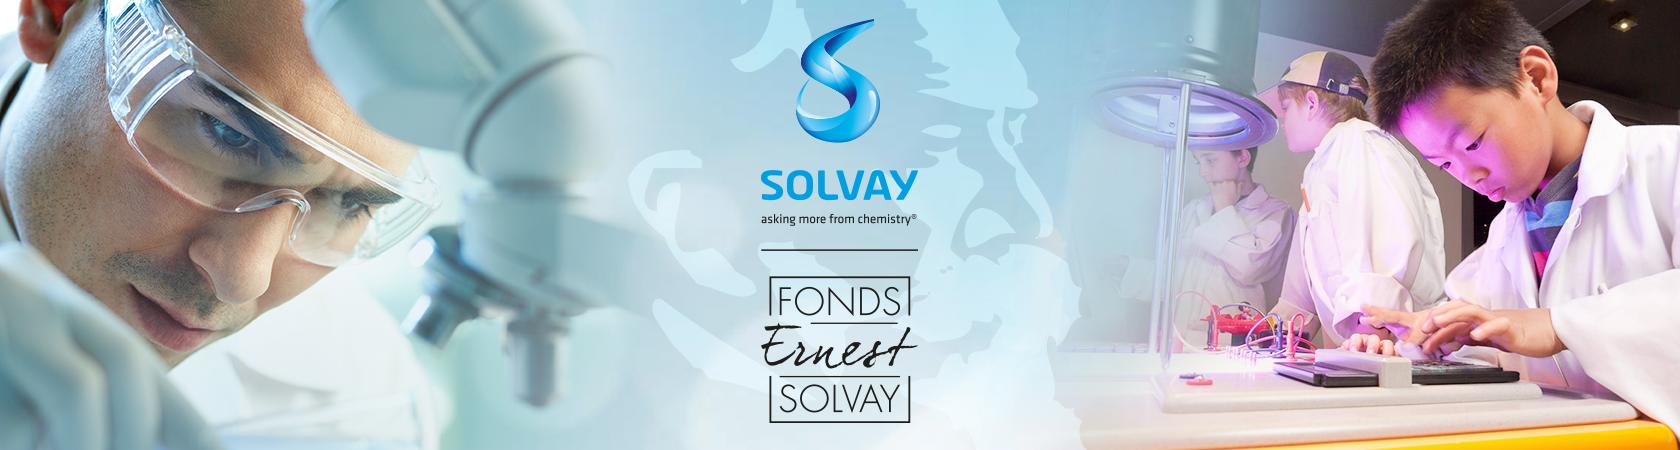 Ernest Solvay Fund